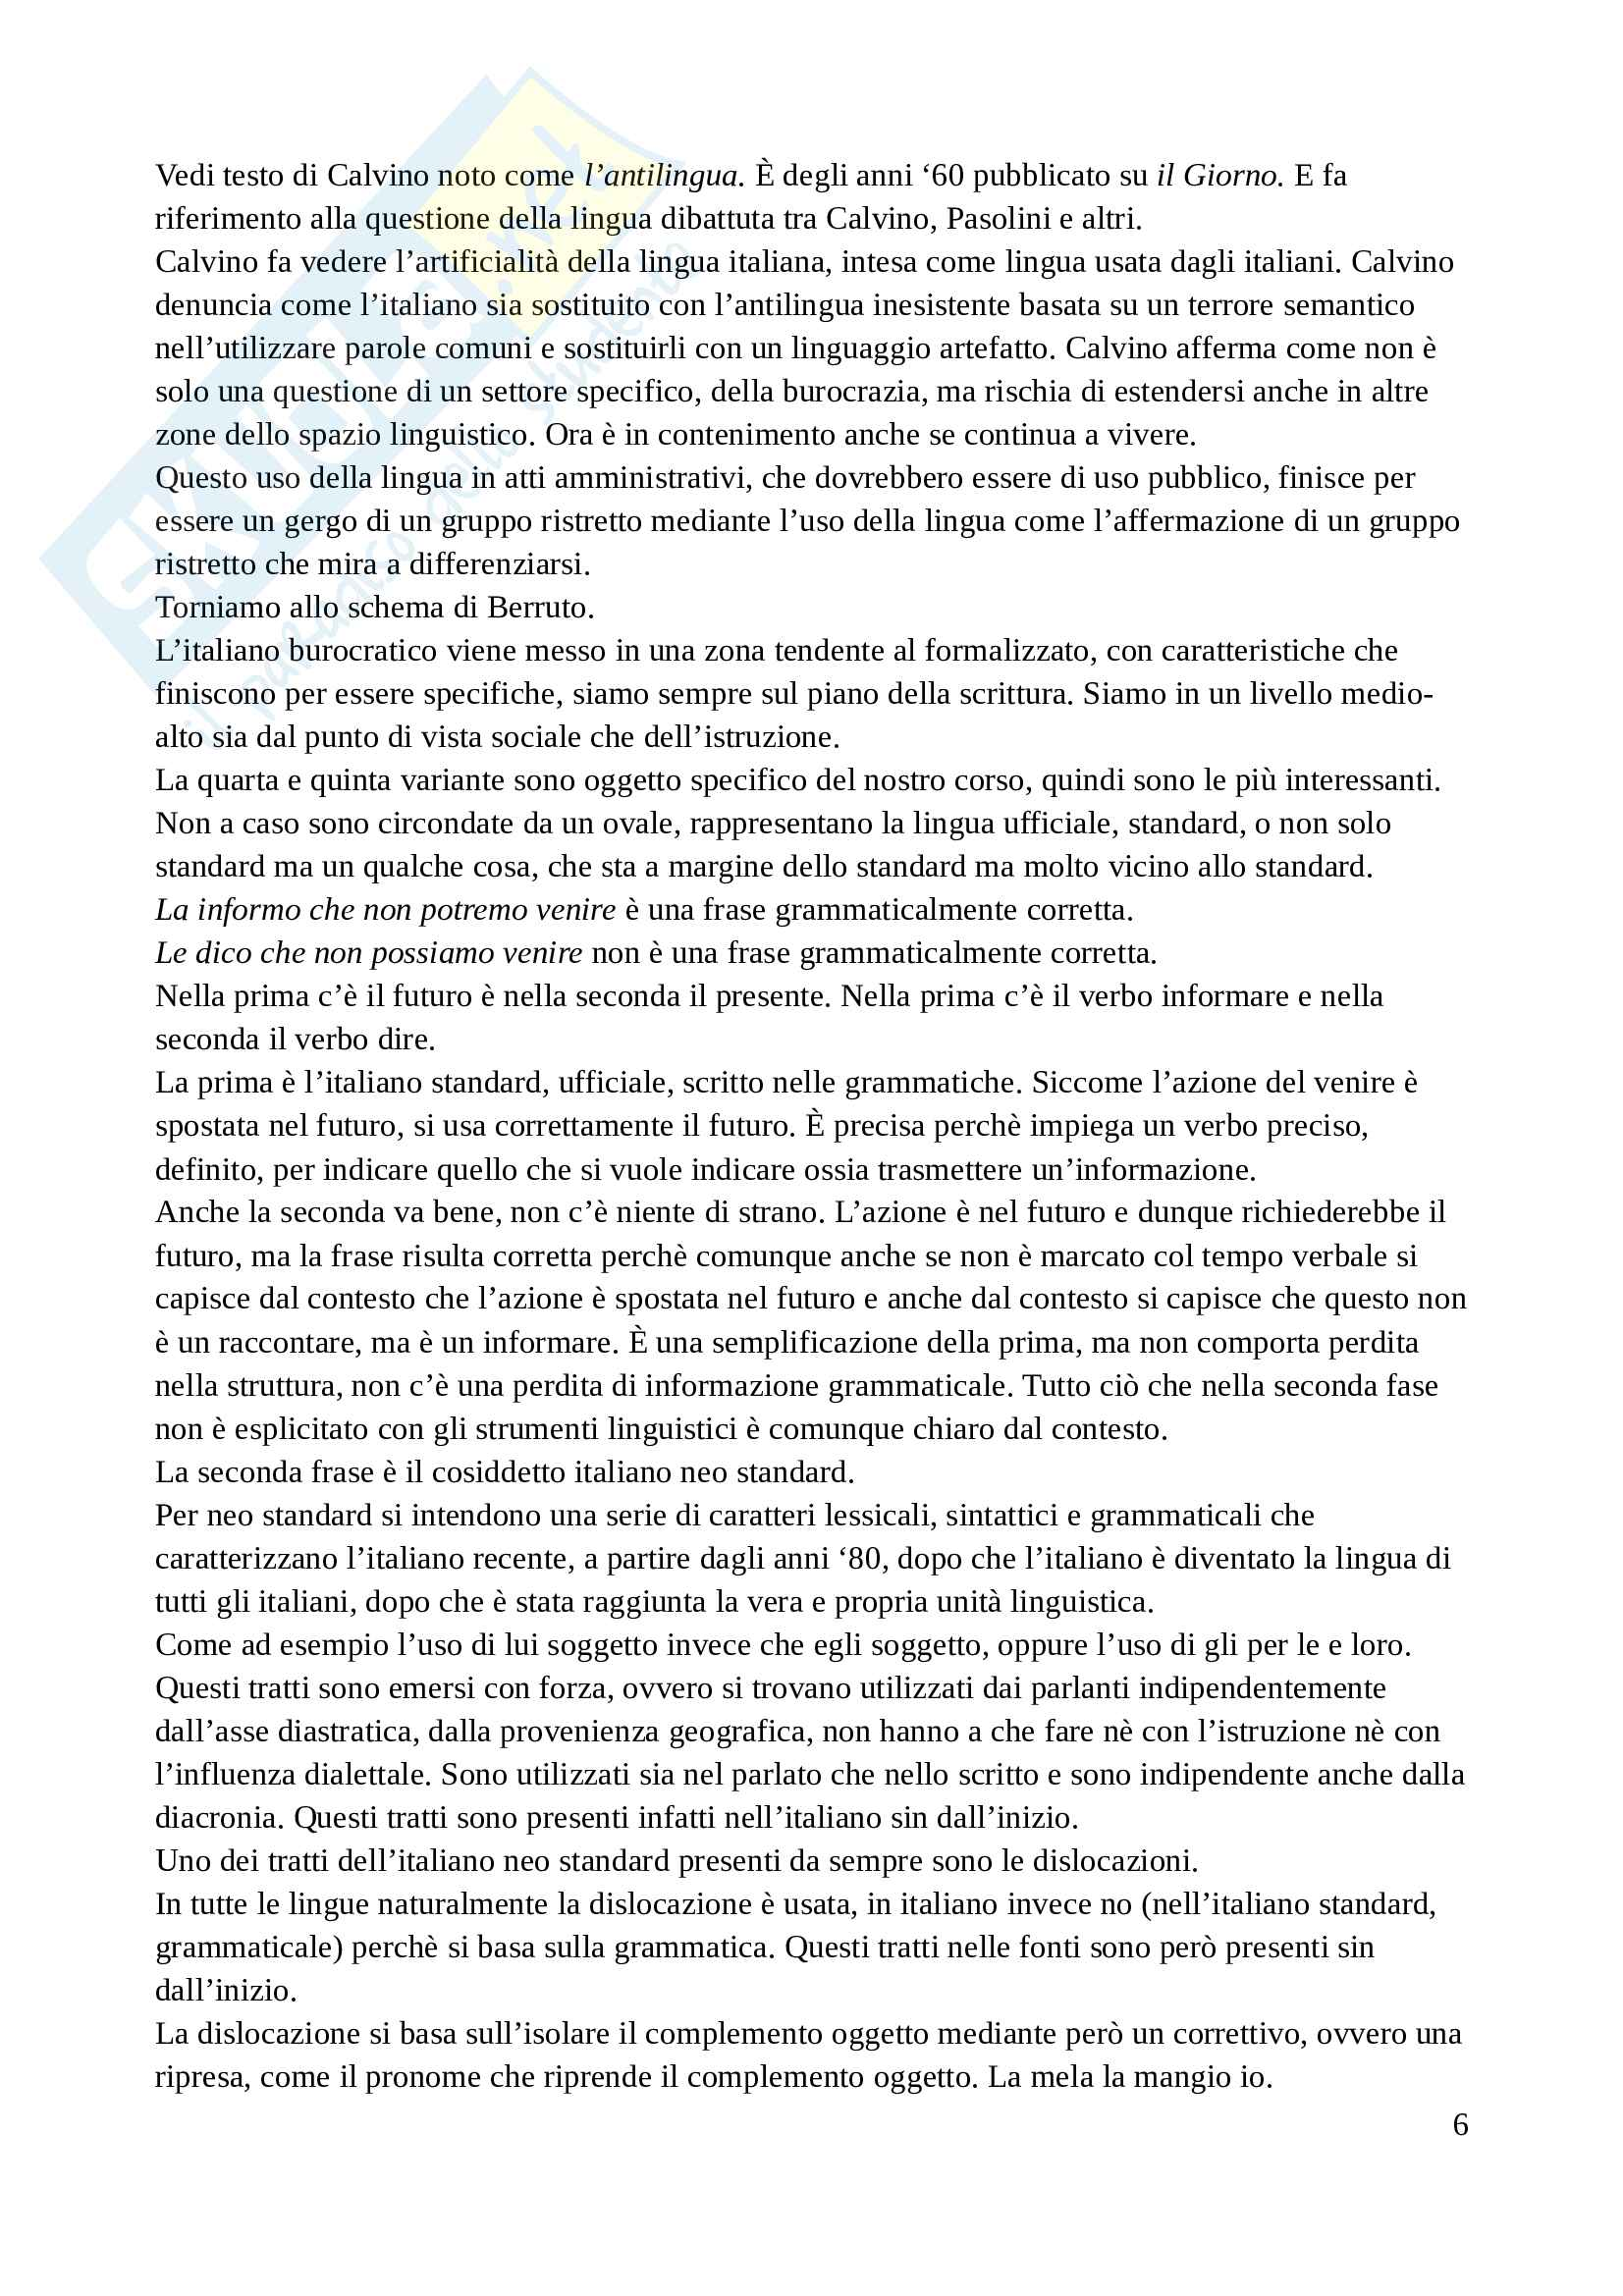 Appunti Grammatica Italiana, prof M. Biffi Pag. 6